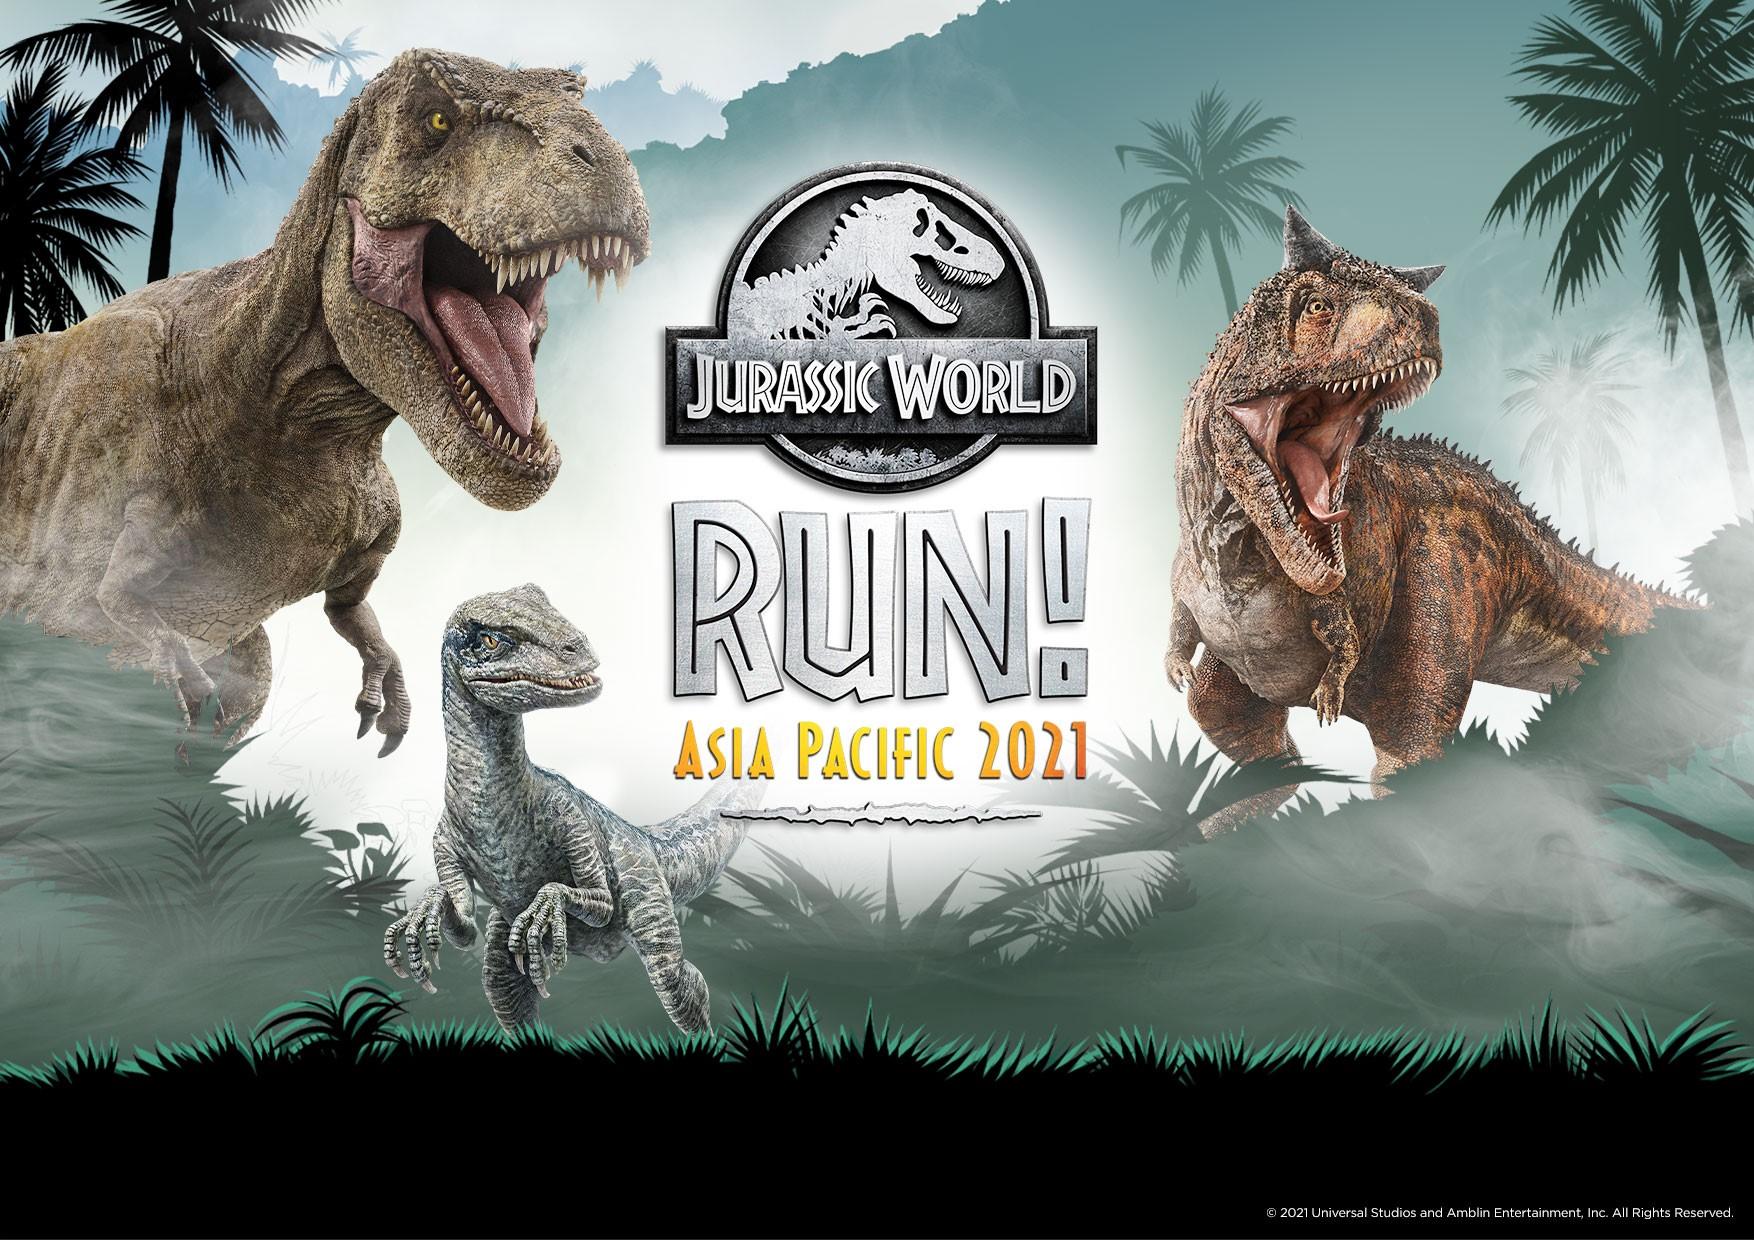 Jurassic World RUN Asia Pacific 2021: Start Running for the First-Ever Jurassic World Virtual Run in Asia Pacific